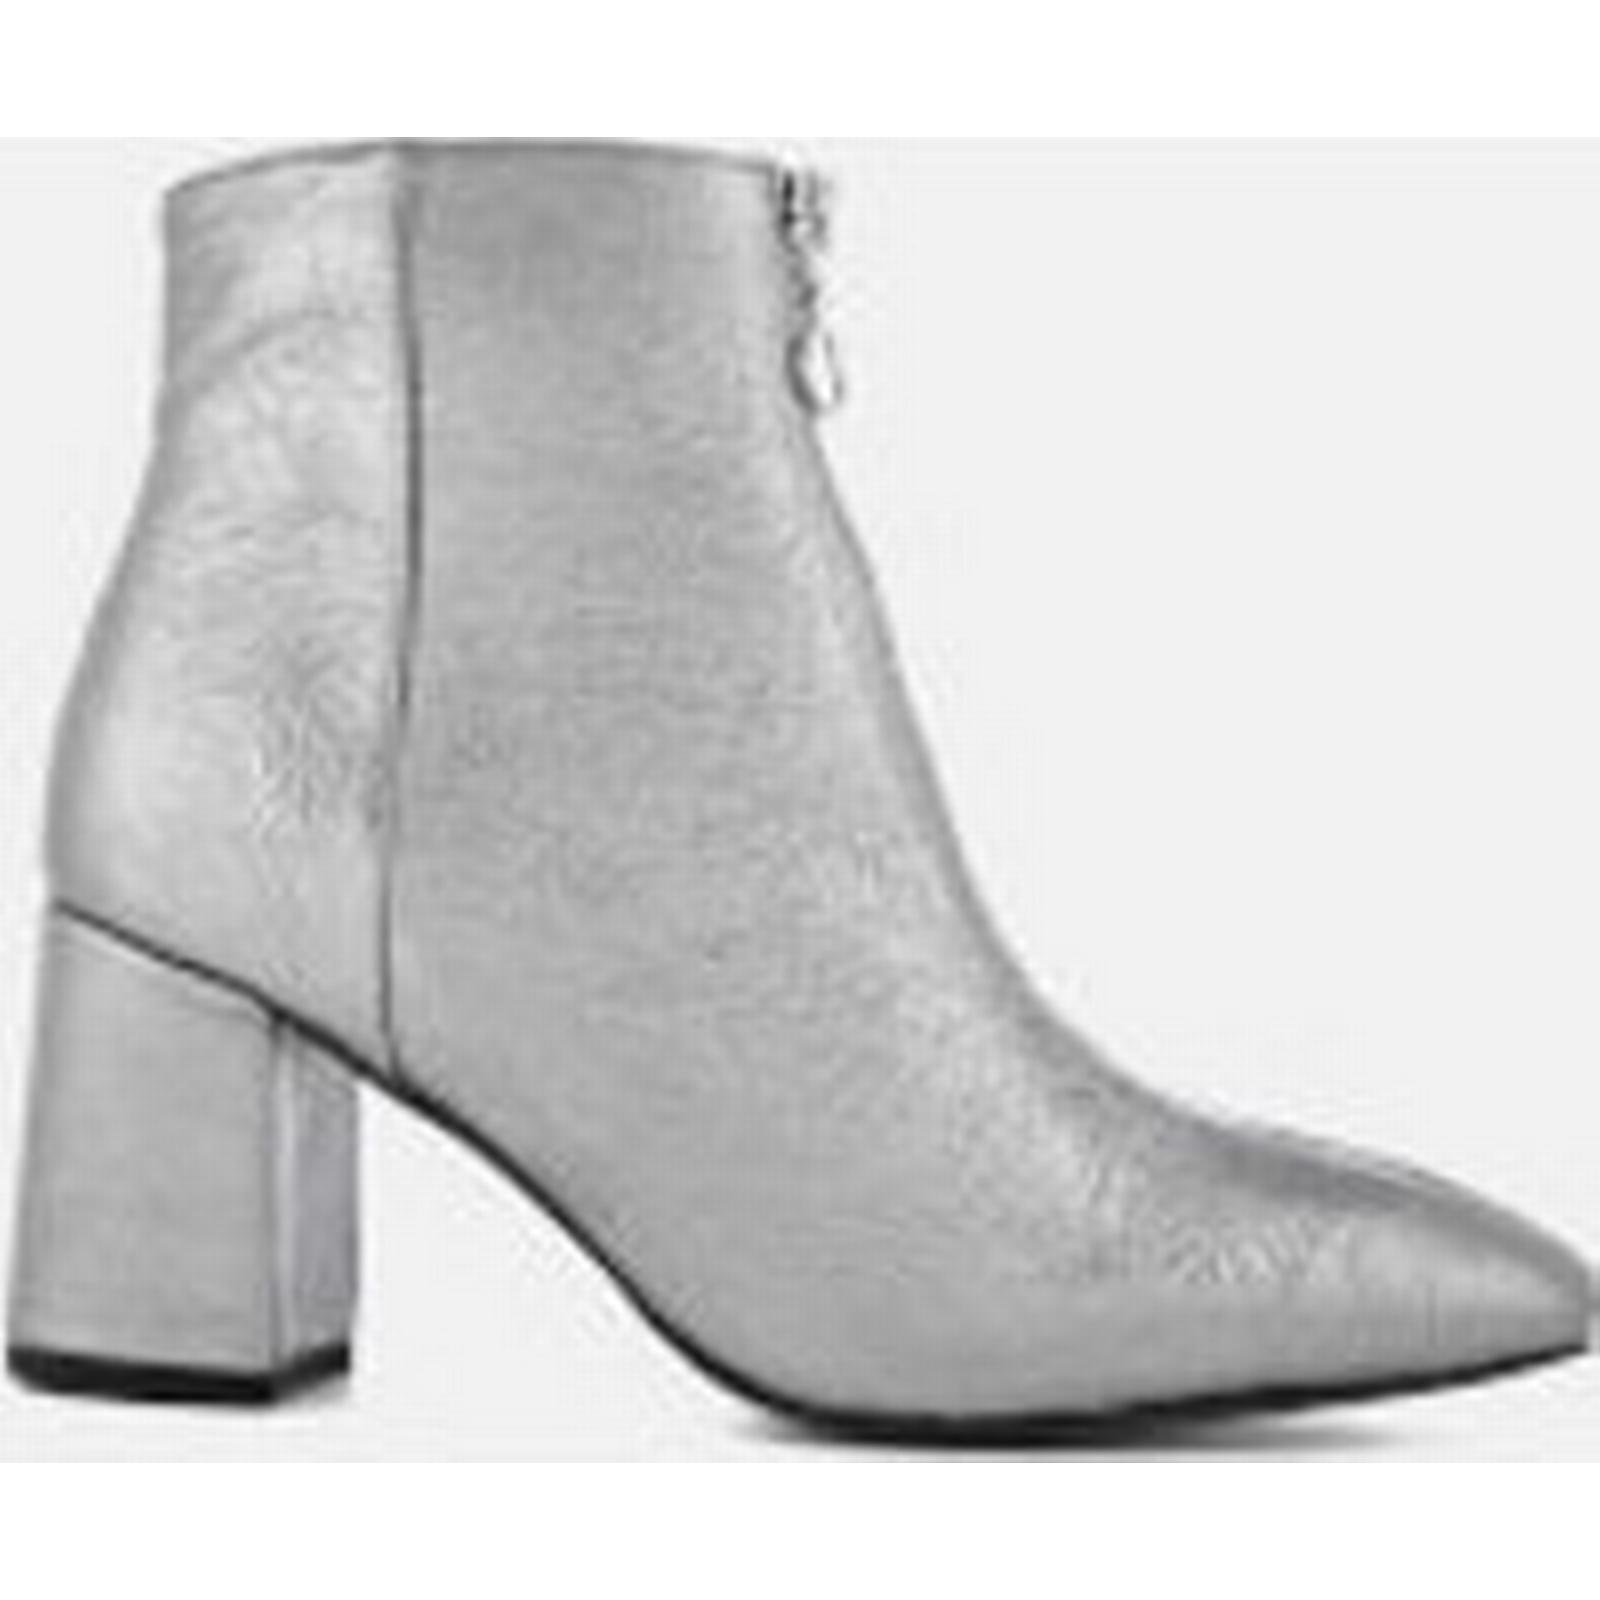 Rebecca Minkoff Women's Stefania Heeled Grey Ankle Boots - Rock Grey Heeled - UK 7 - Grey c4fc4f